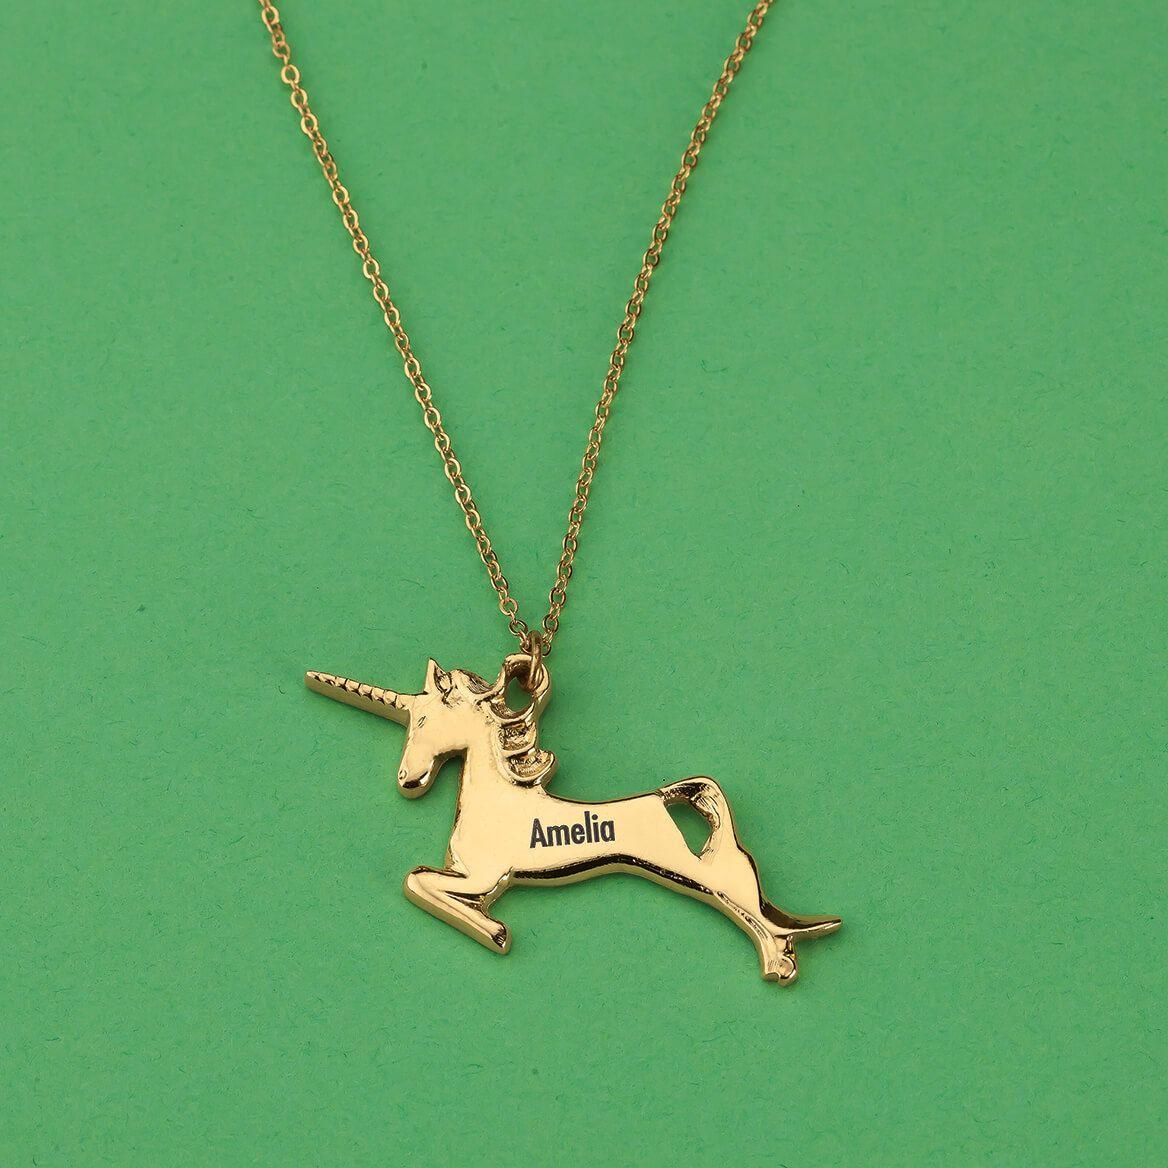 Personalized Children's Goldtone Unicorn Necklace-369439